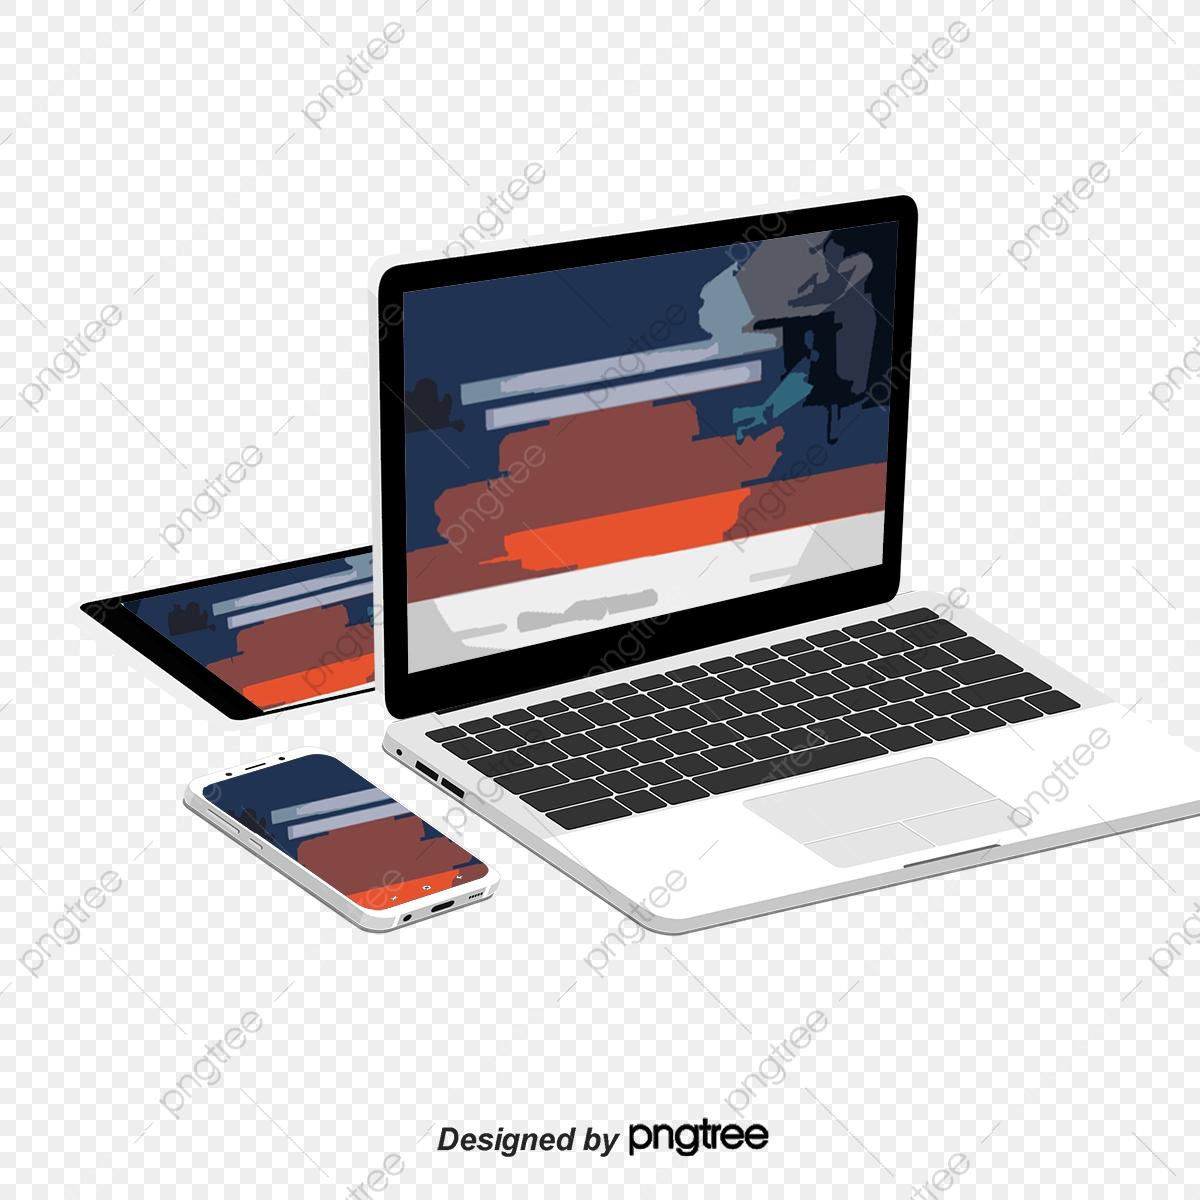 Apple Macbook, Product Kind, Apple Ultrabooks PNG Transparent.